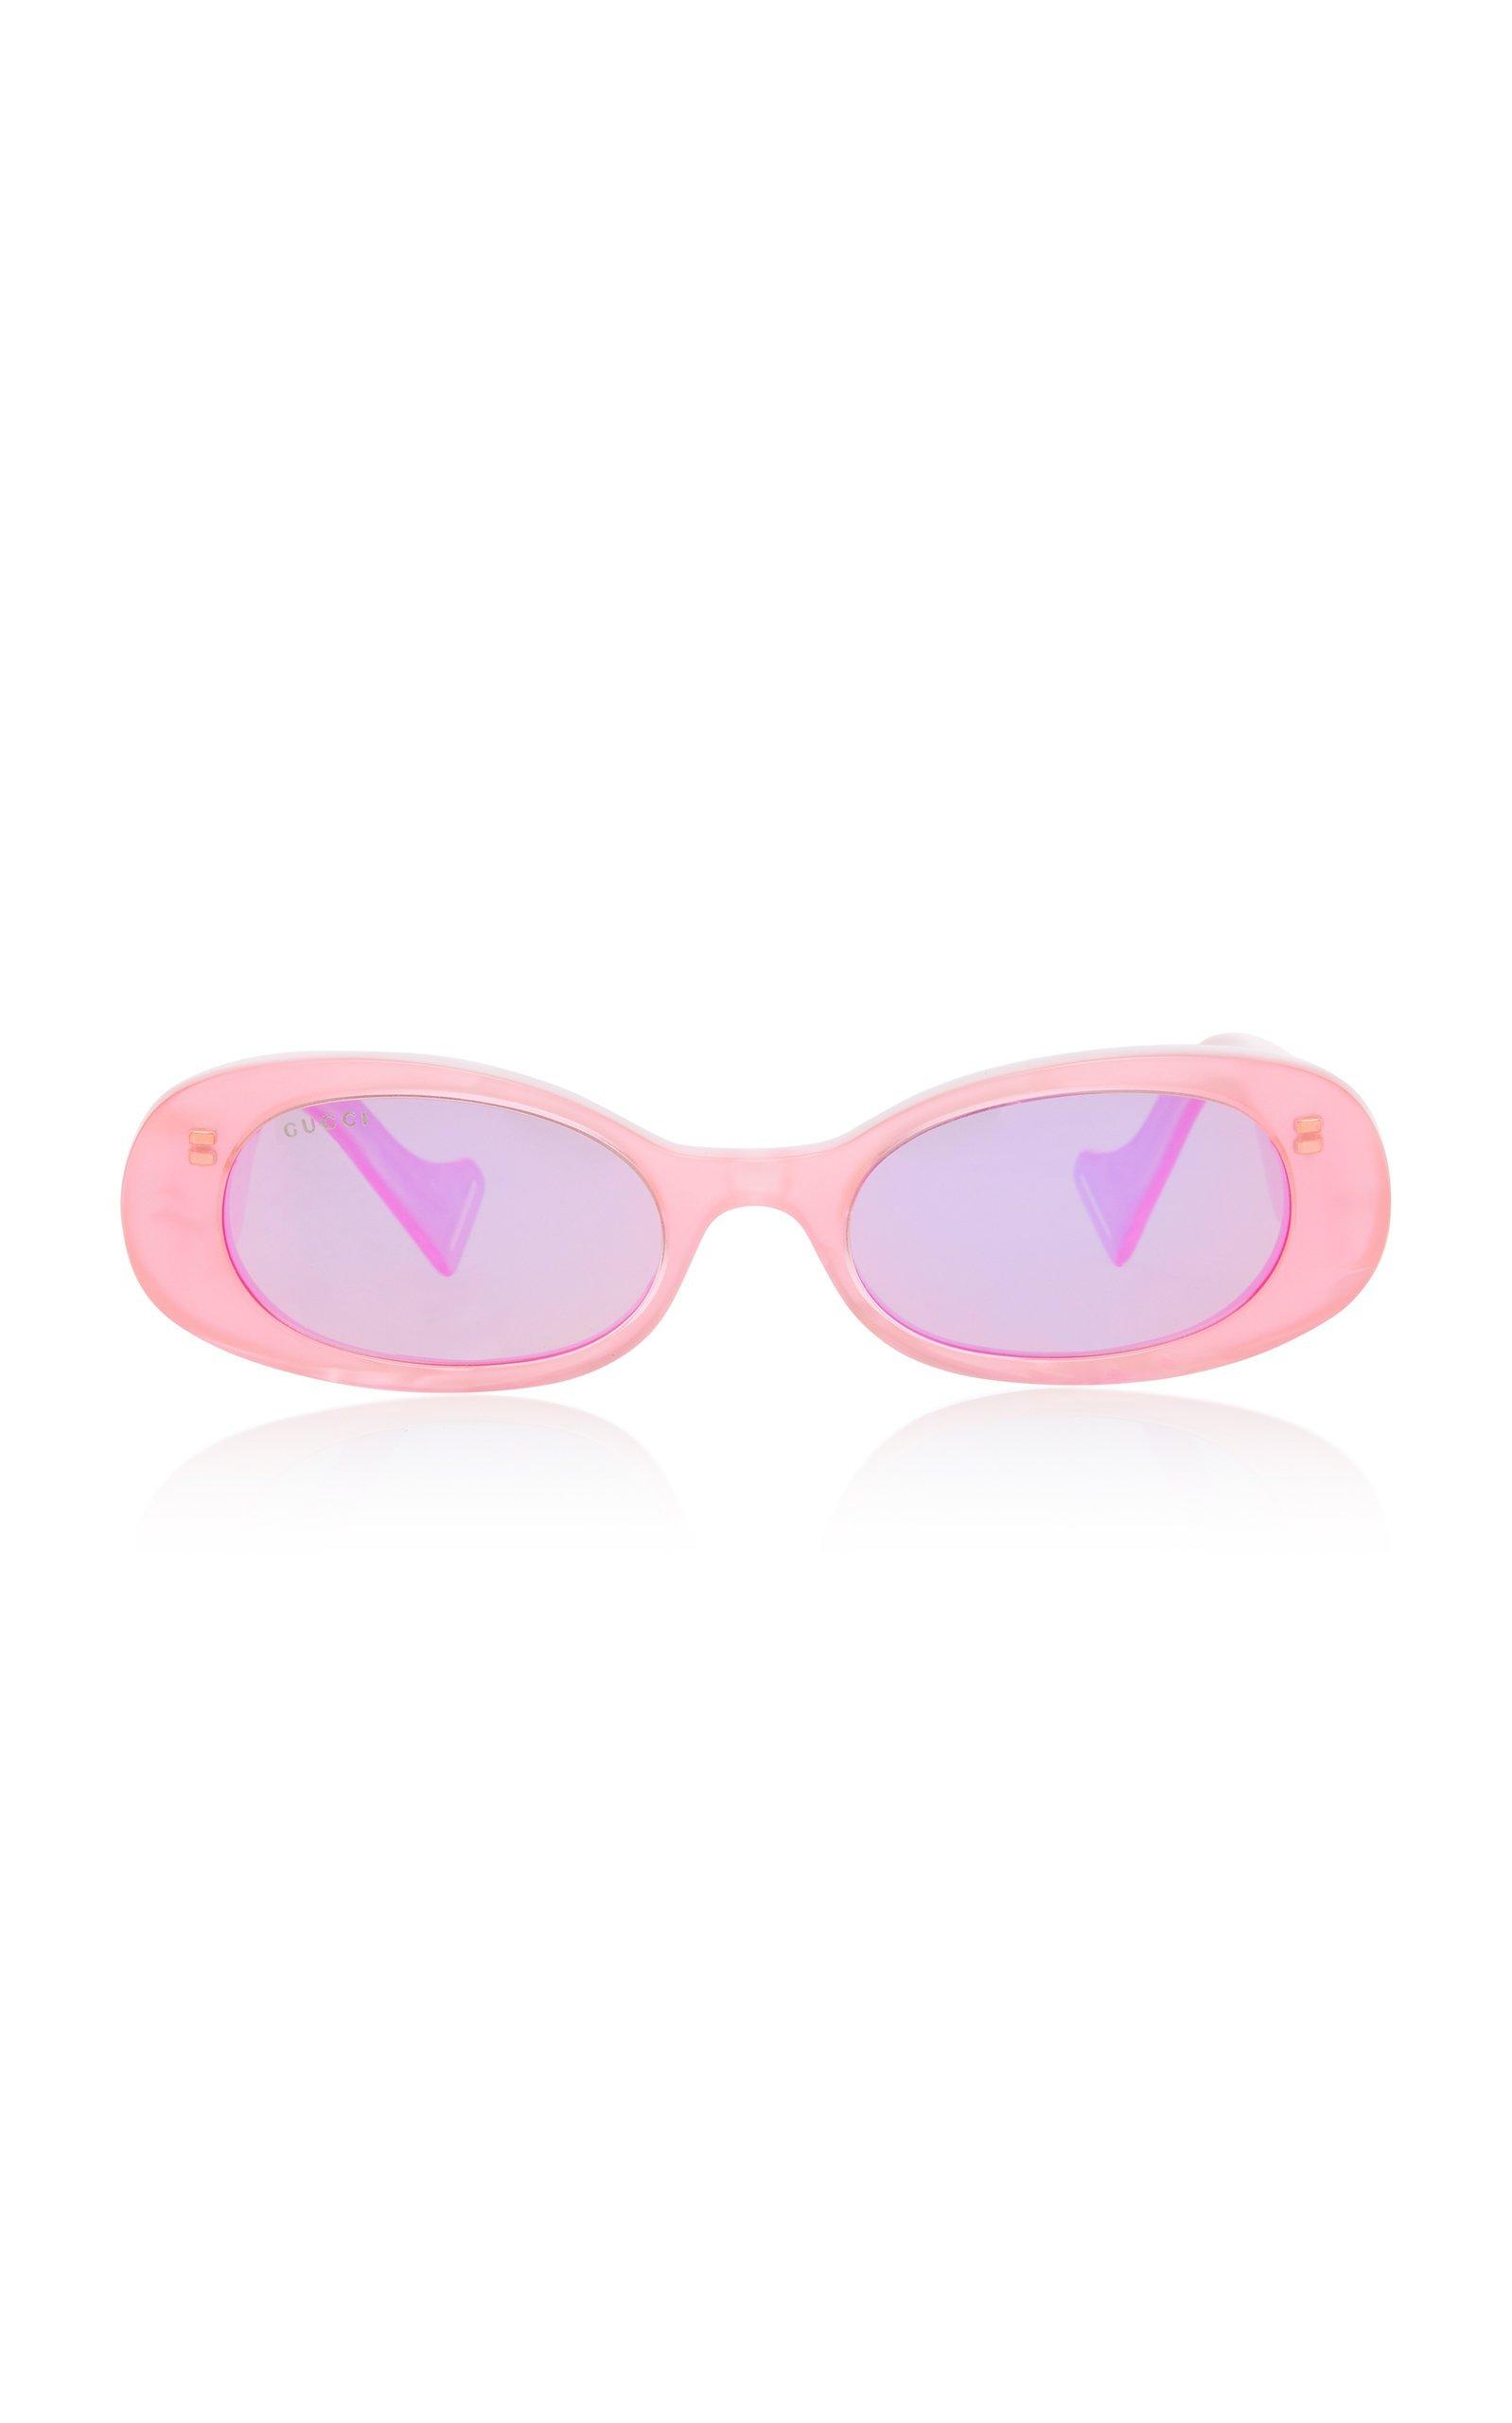 Oval-Frame Acetate Sunglasses by Gucci | Moda Operandi